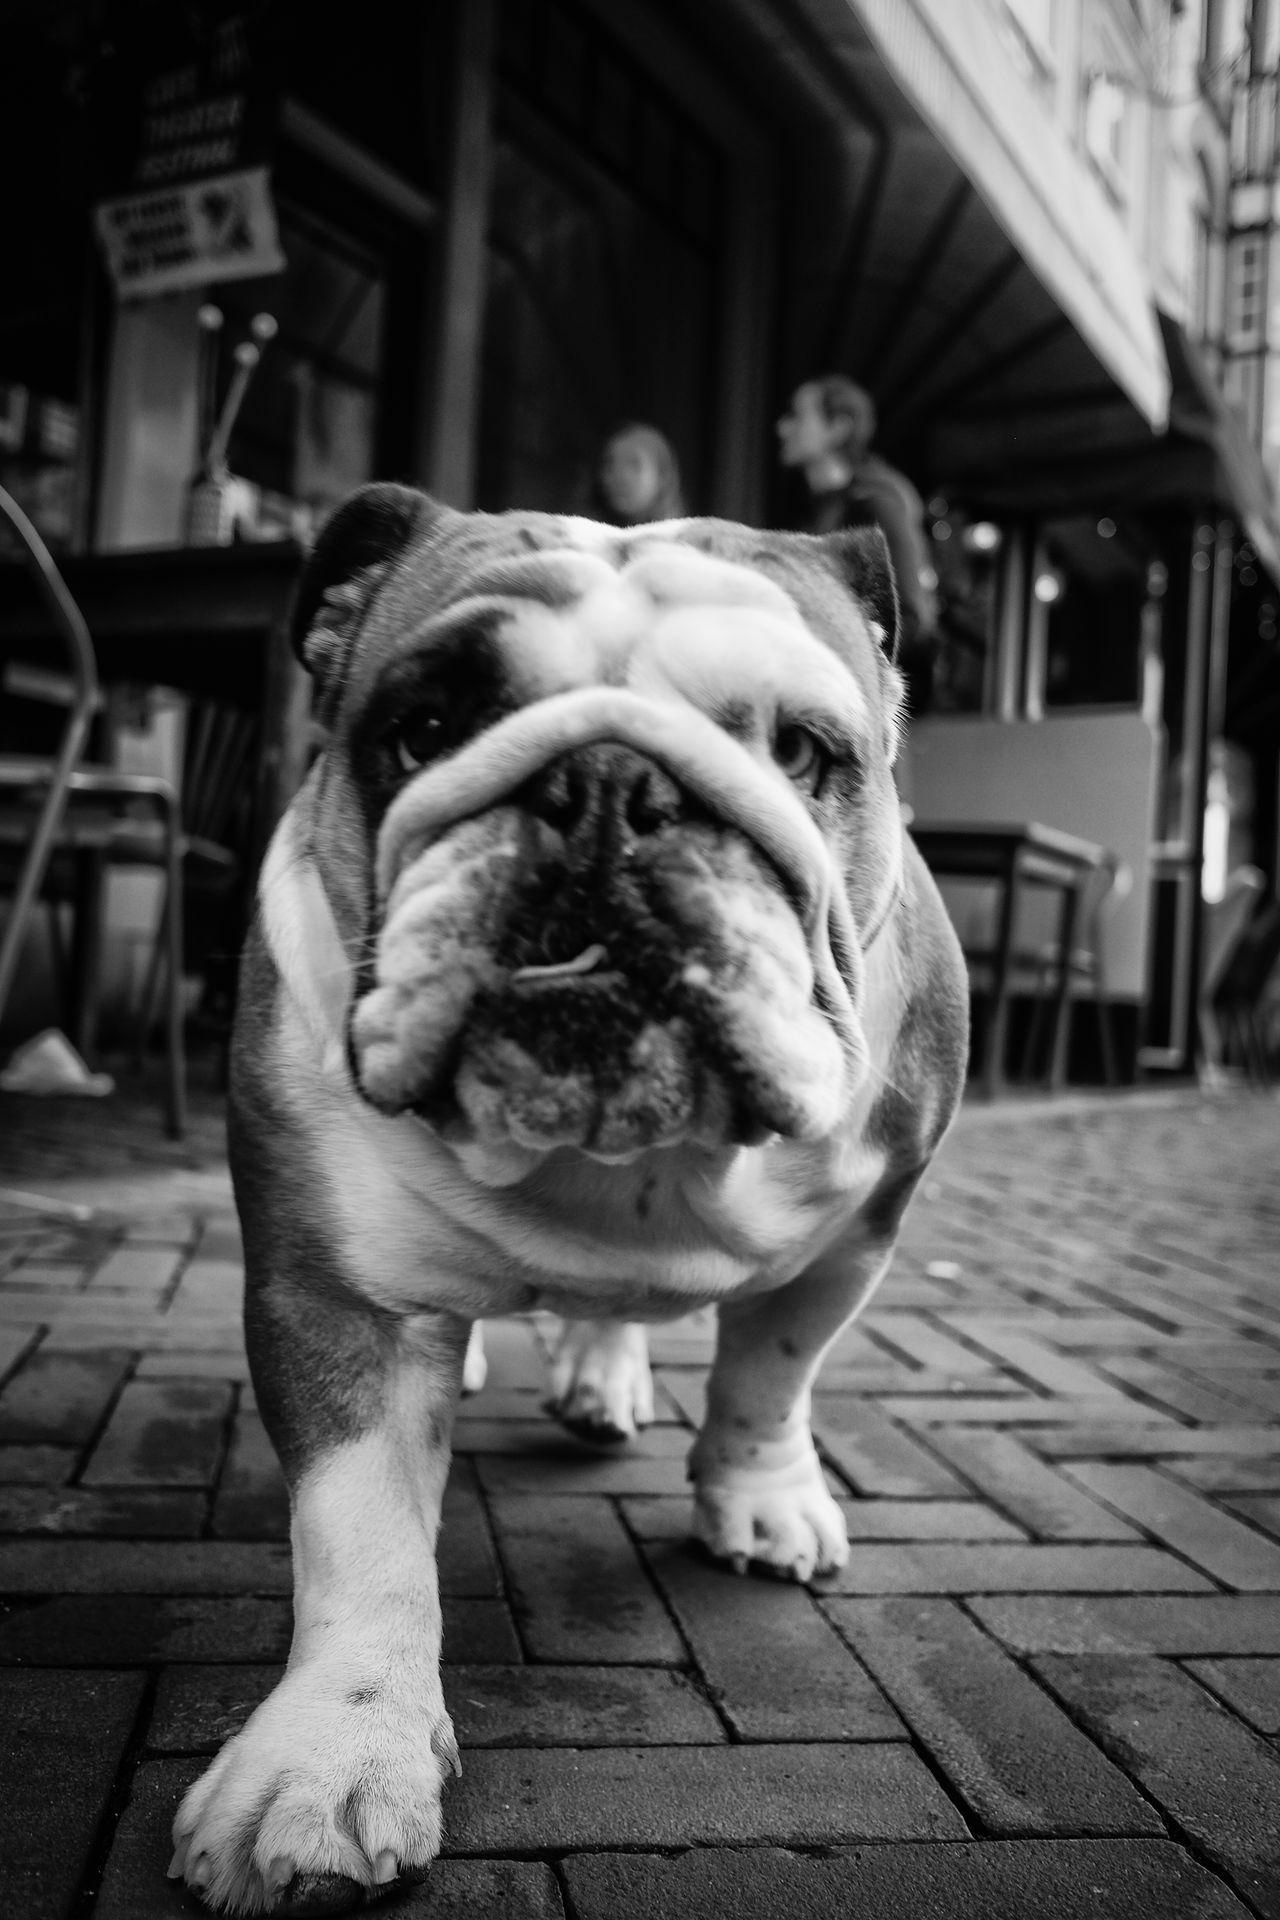 Gonna catch ya... Animal Themes B&w Blackandwhite Close-up Day Dog Domestic Animals English Bulldog Mammal Monochrome No People One Animal Outdoors Pets